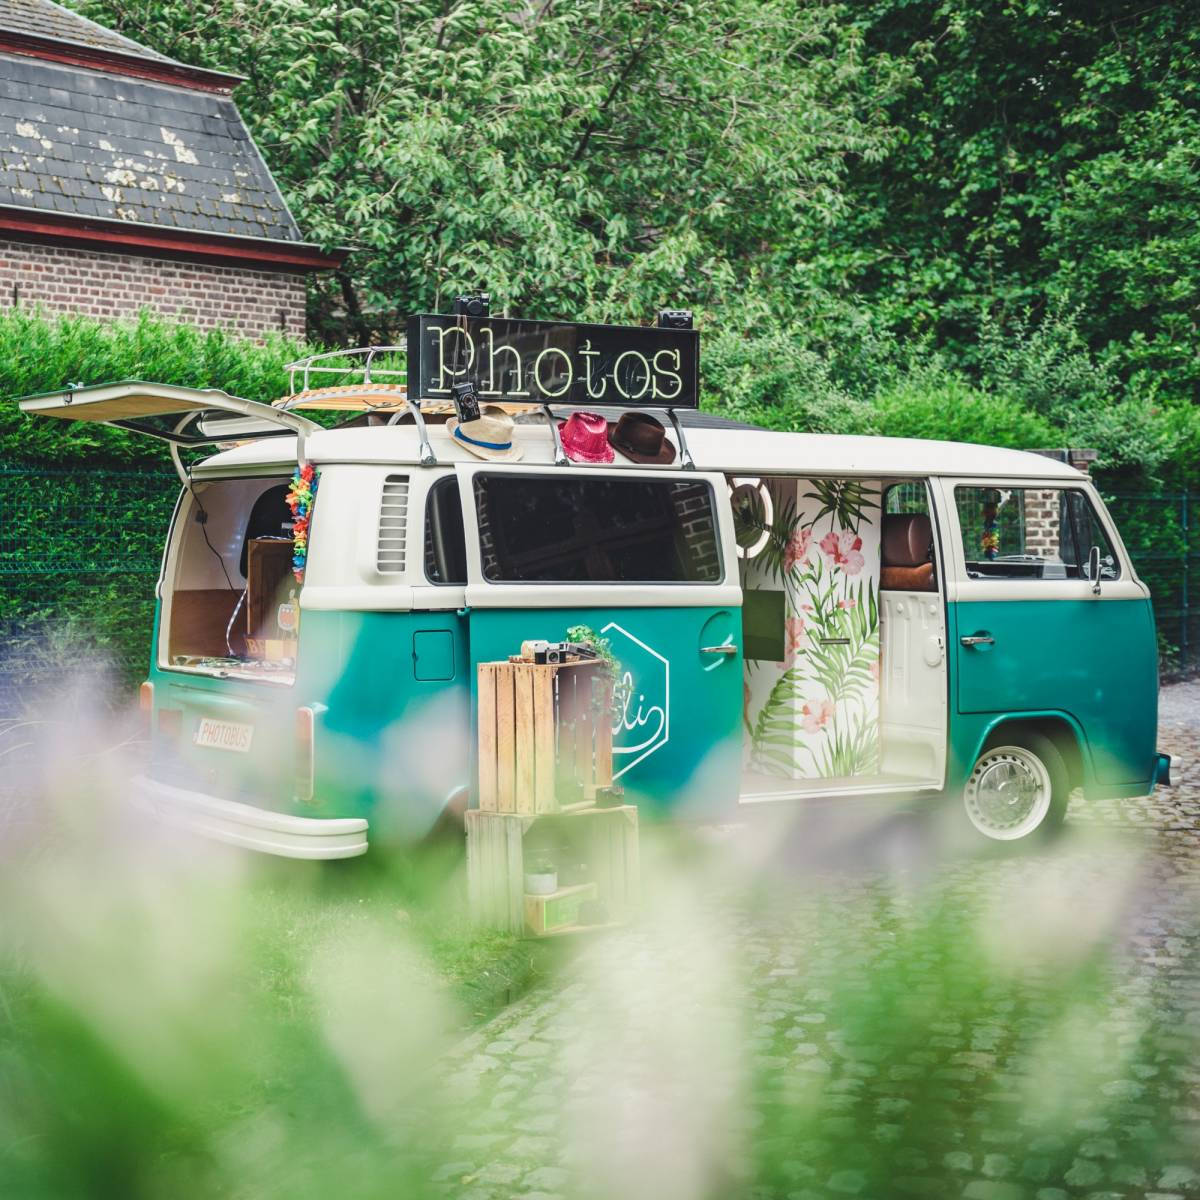 Bulli - Photobooth - House of Weddings (4)